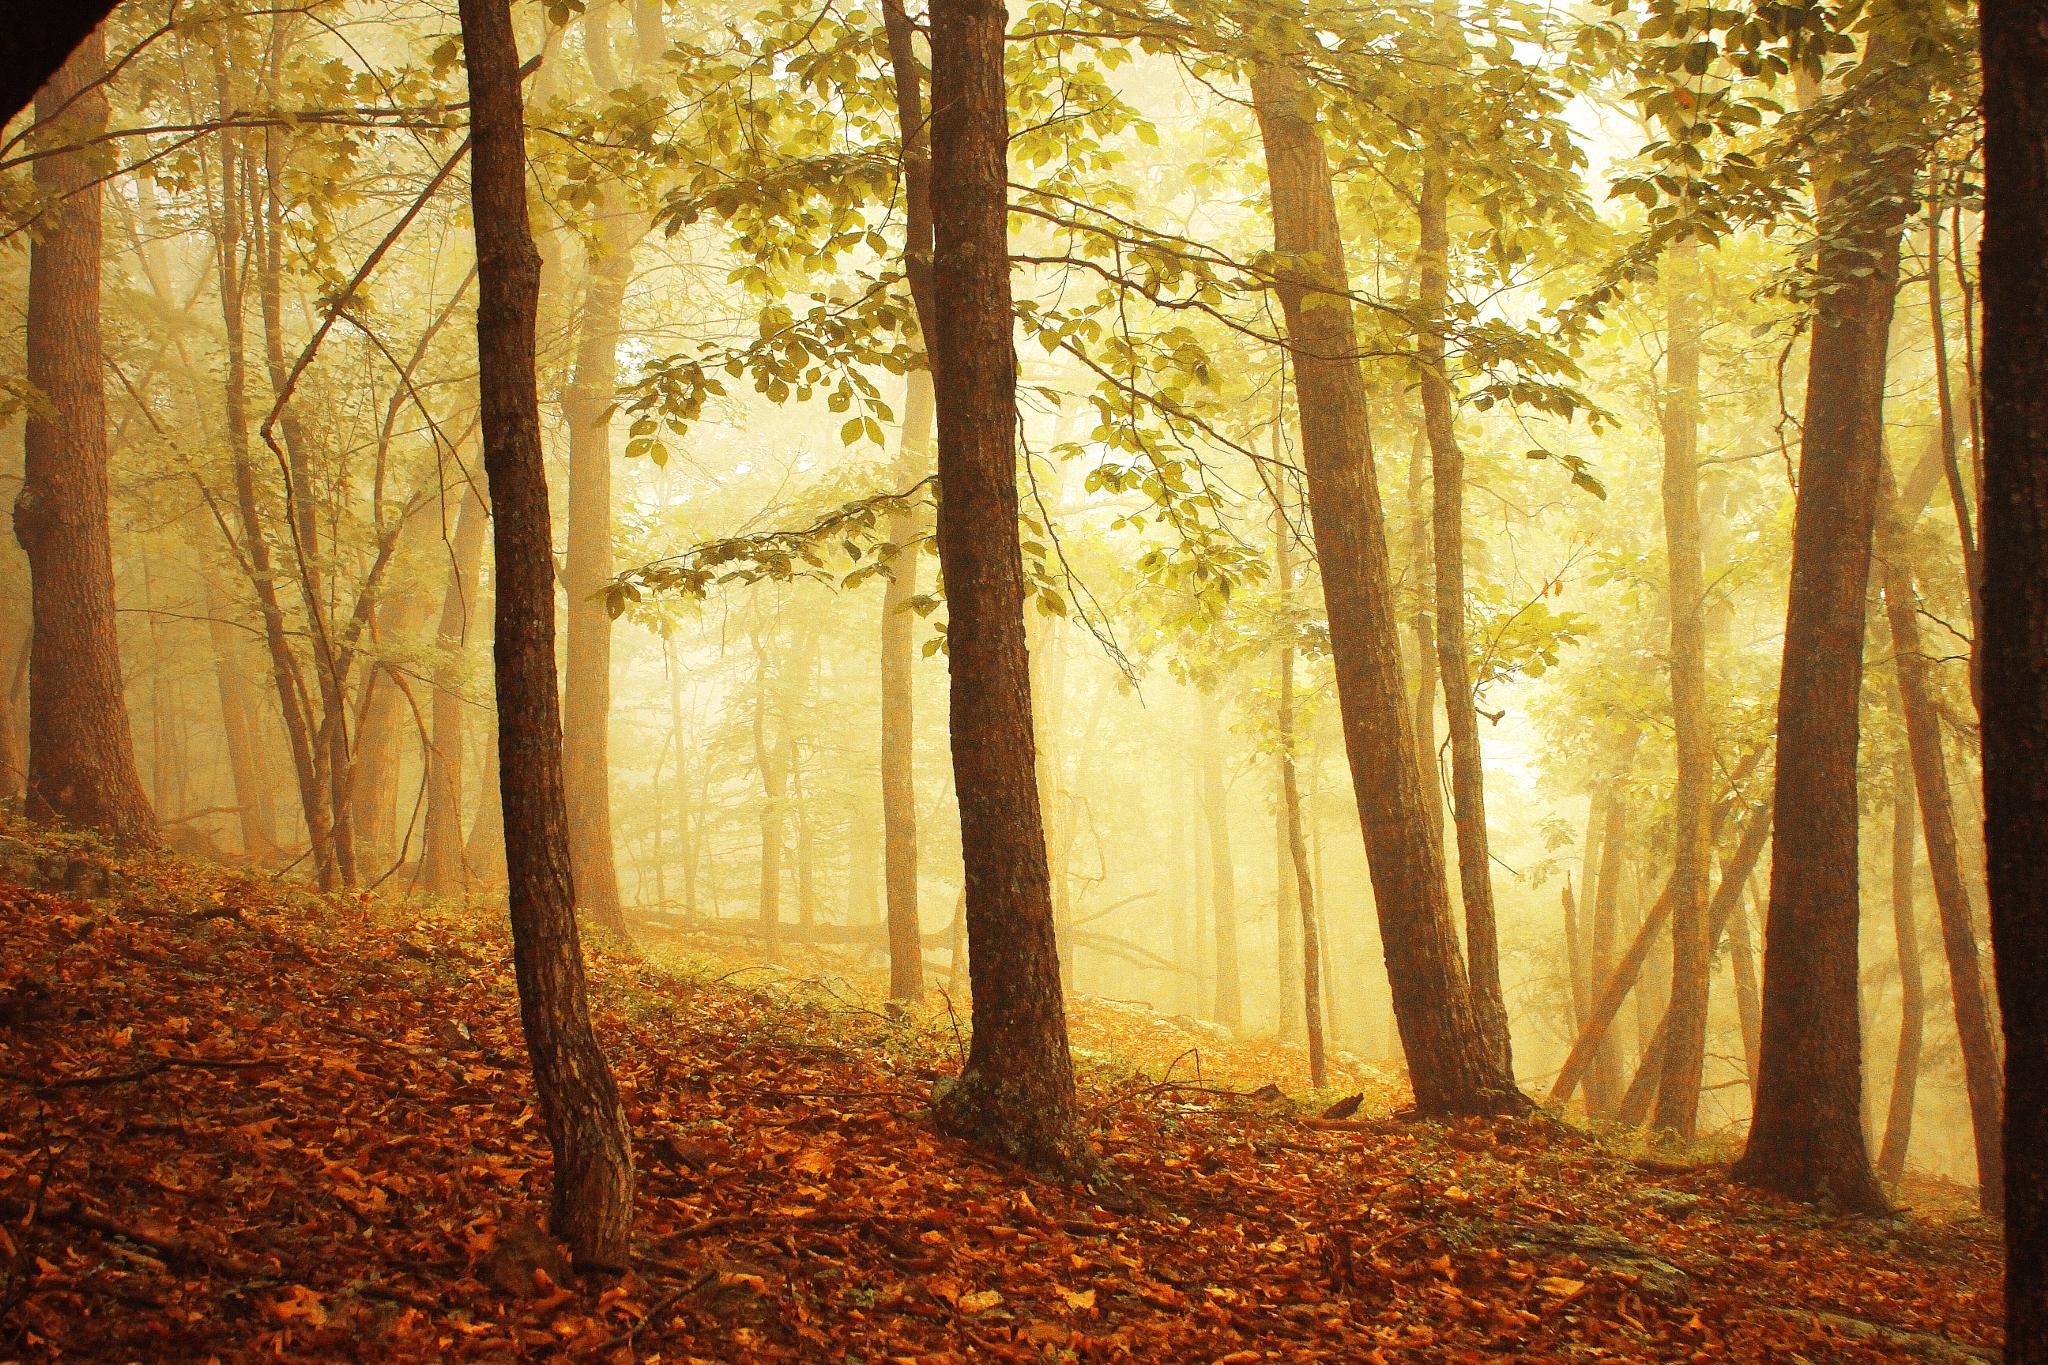 Warm Fog by Aaron Shaver